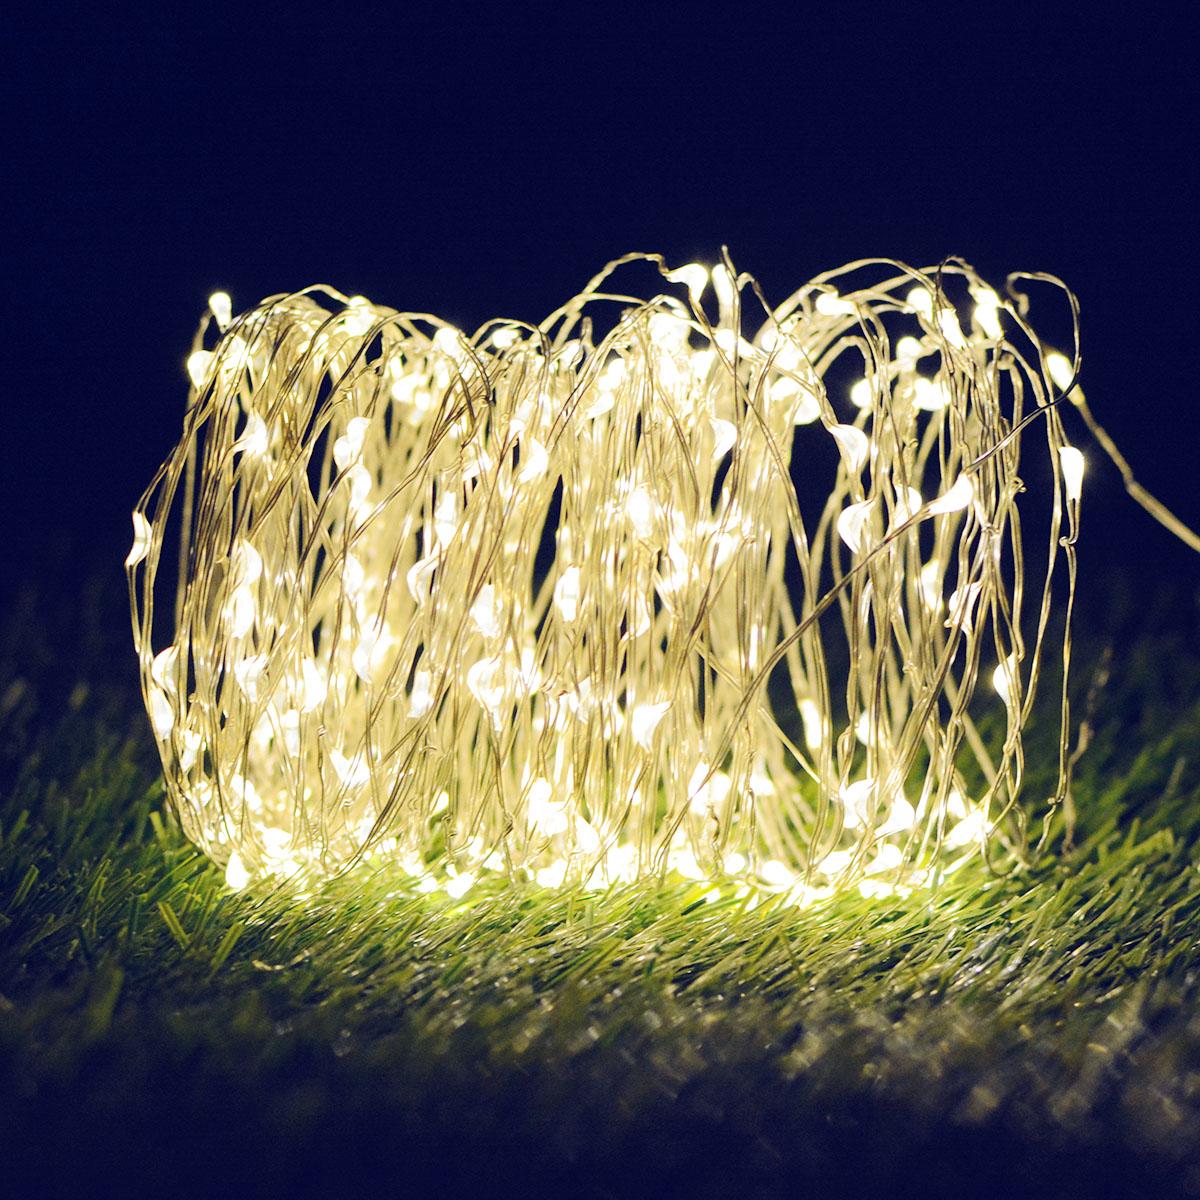 10M/20M 100LEDs/200LEDs Romanstic Solar Powered Copper Wire String Light warm light_20 meters 200 LED_(ME0004102)